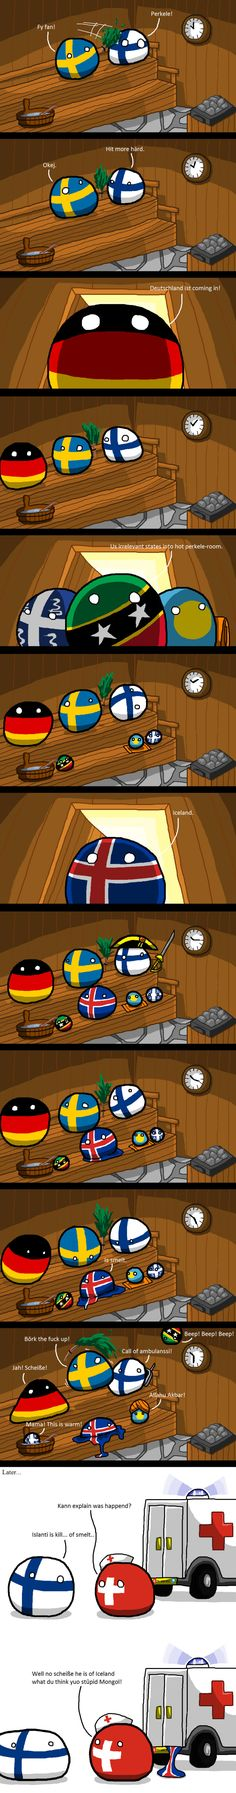 Iceland cannot into Sauna - 9GAG